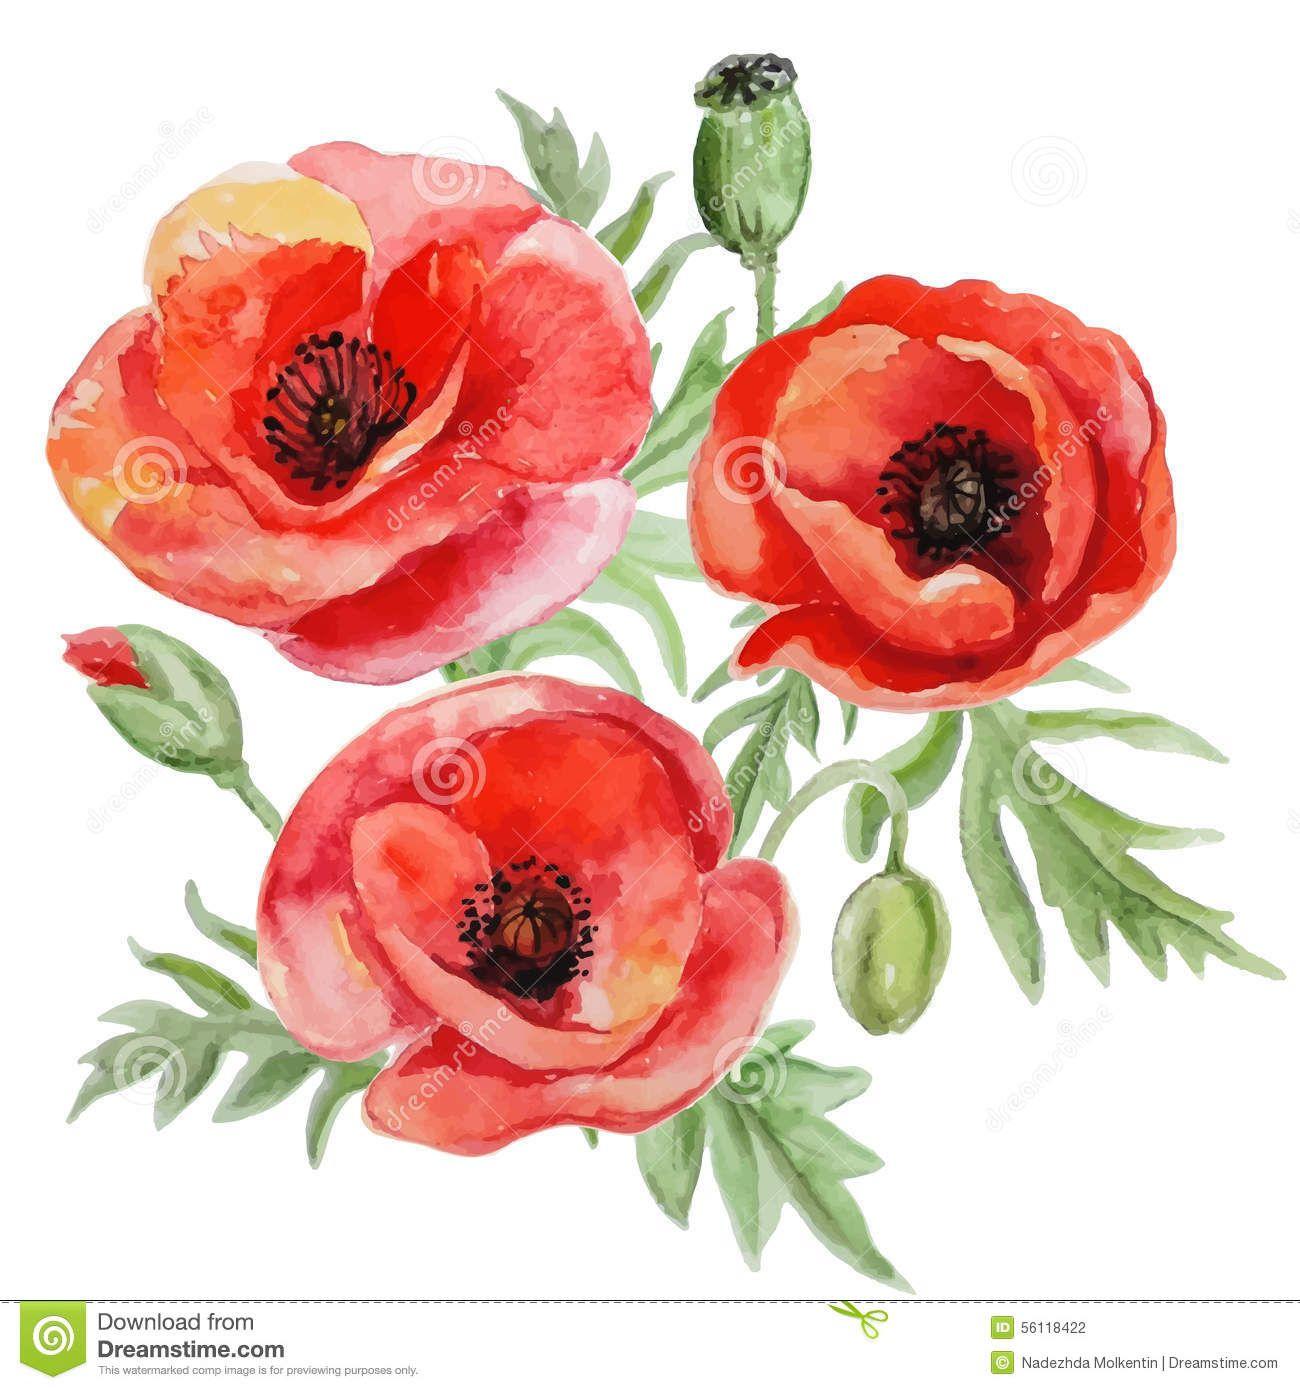 vectorbouquetredwatercolorpoppyflowers56118422.jpg